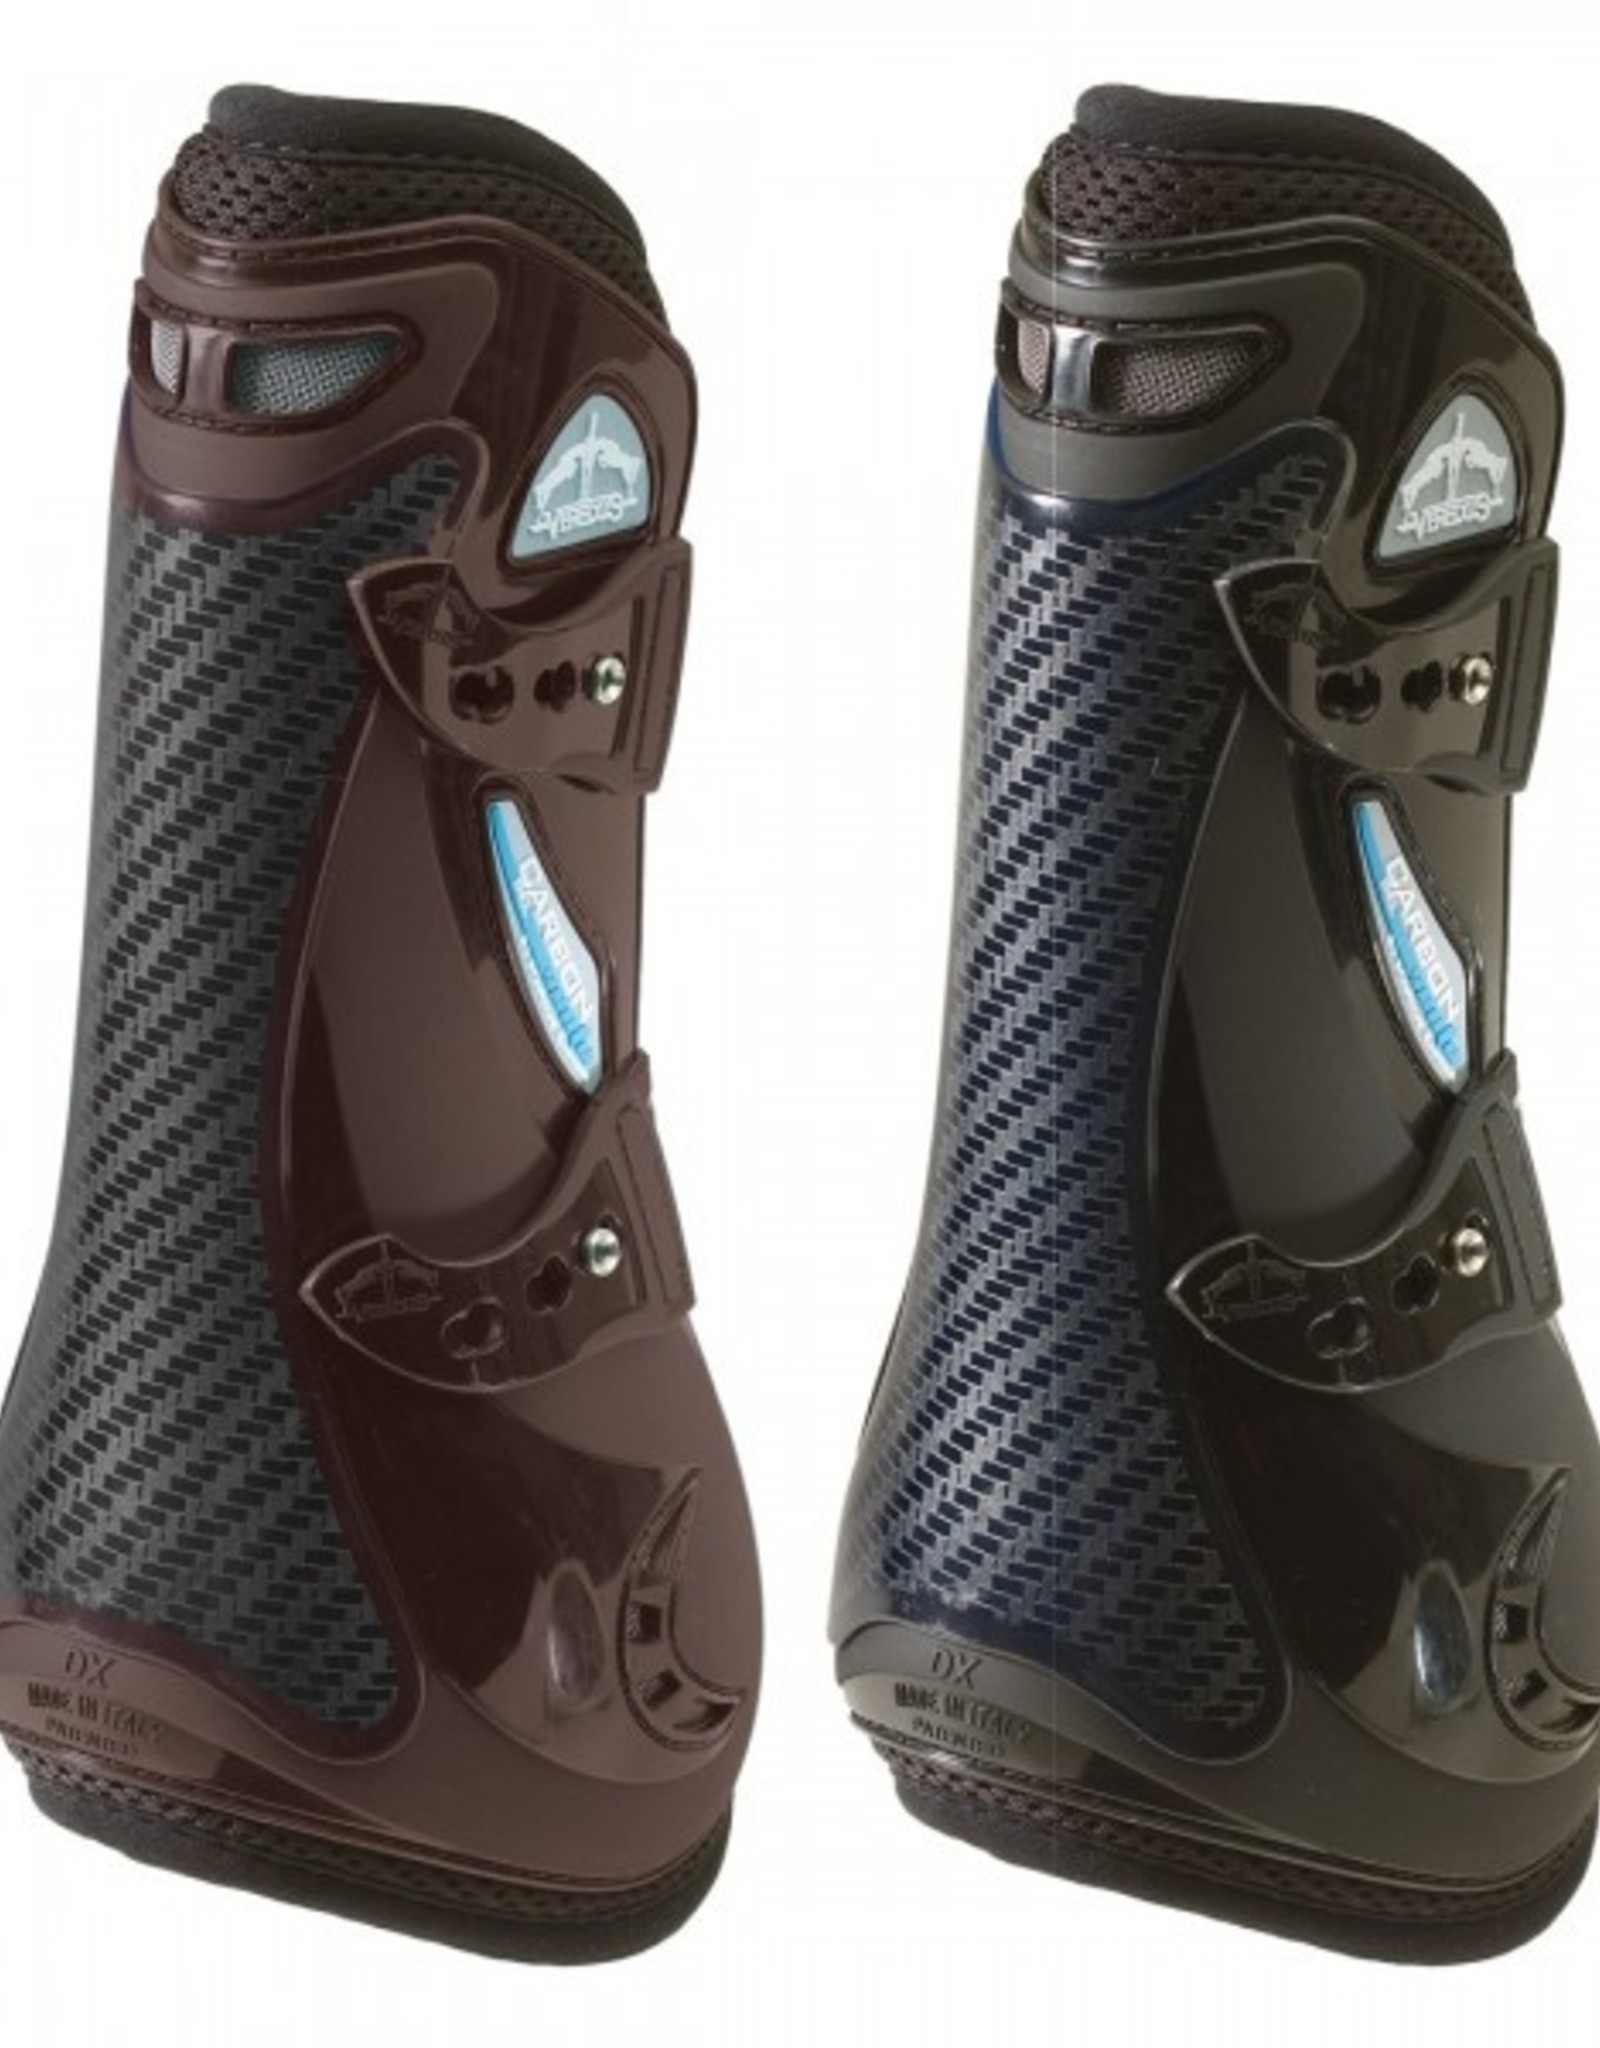 Veredus Carbon Gel Vento Front Boot